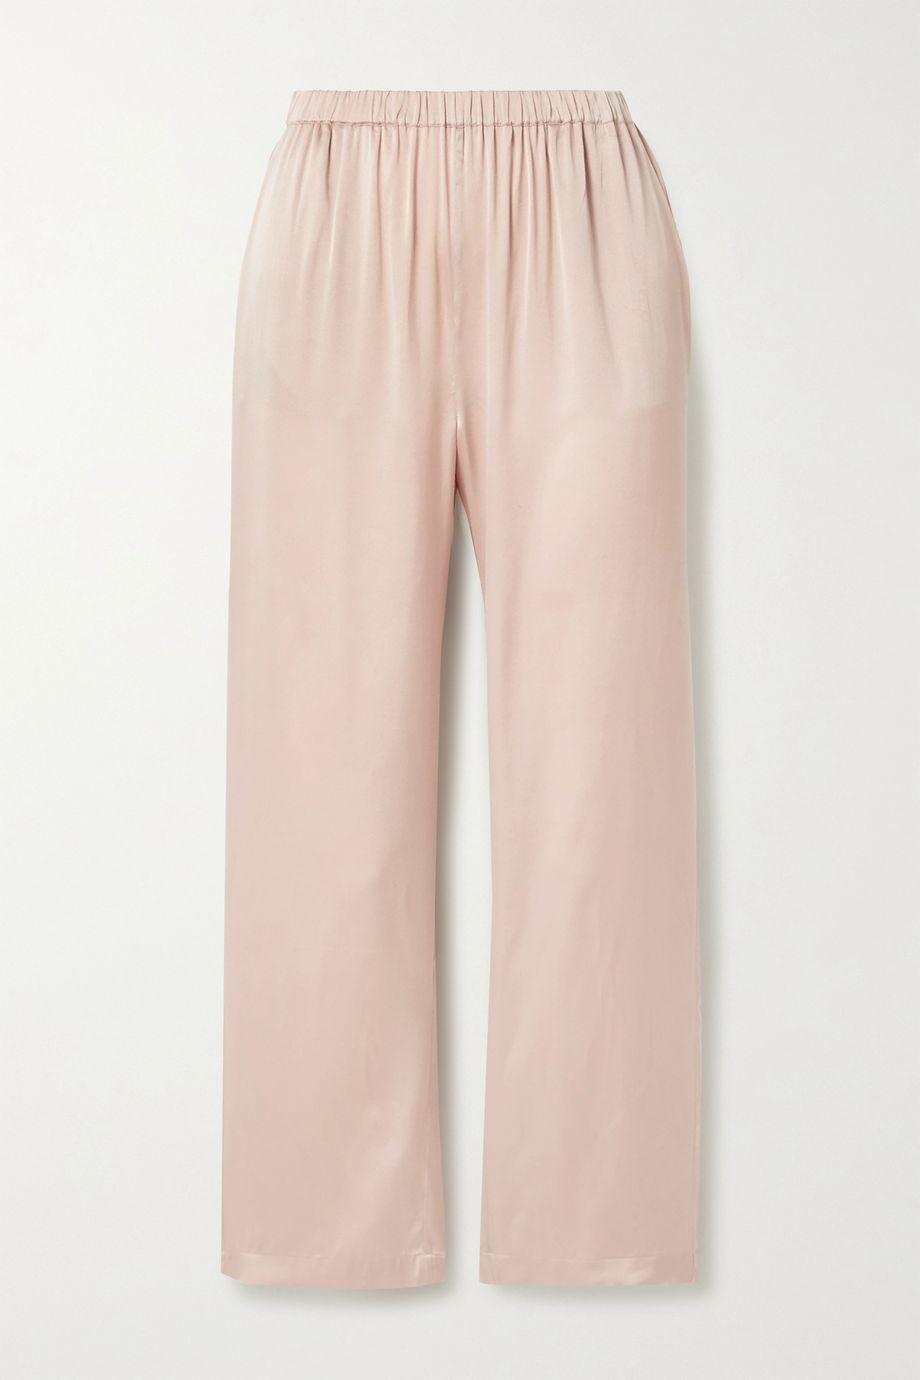 Skin Washed stretch-silk satin pants